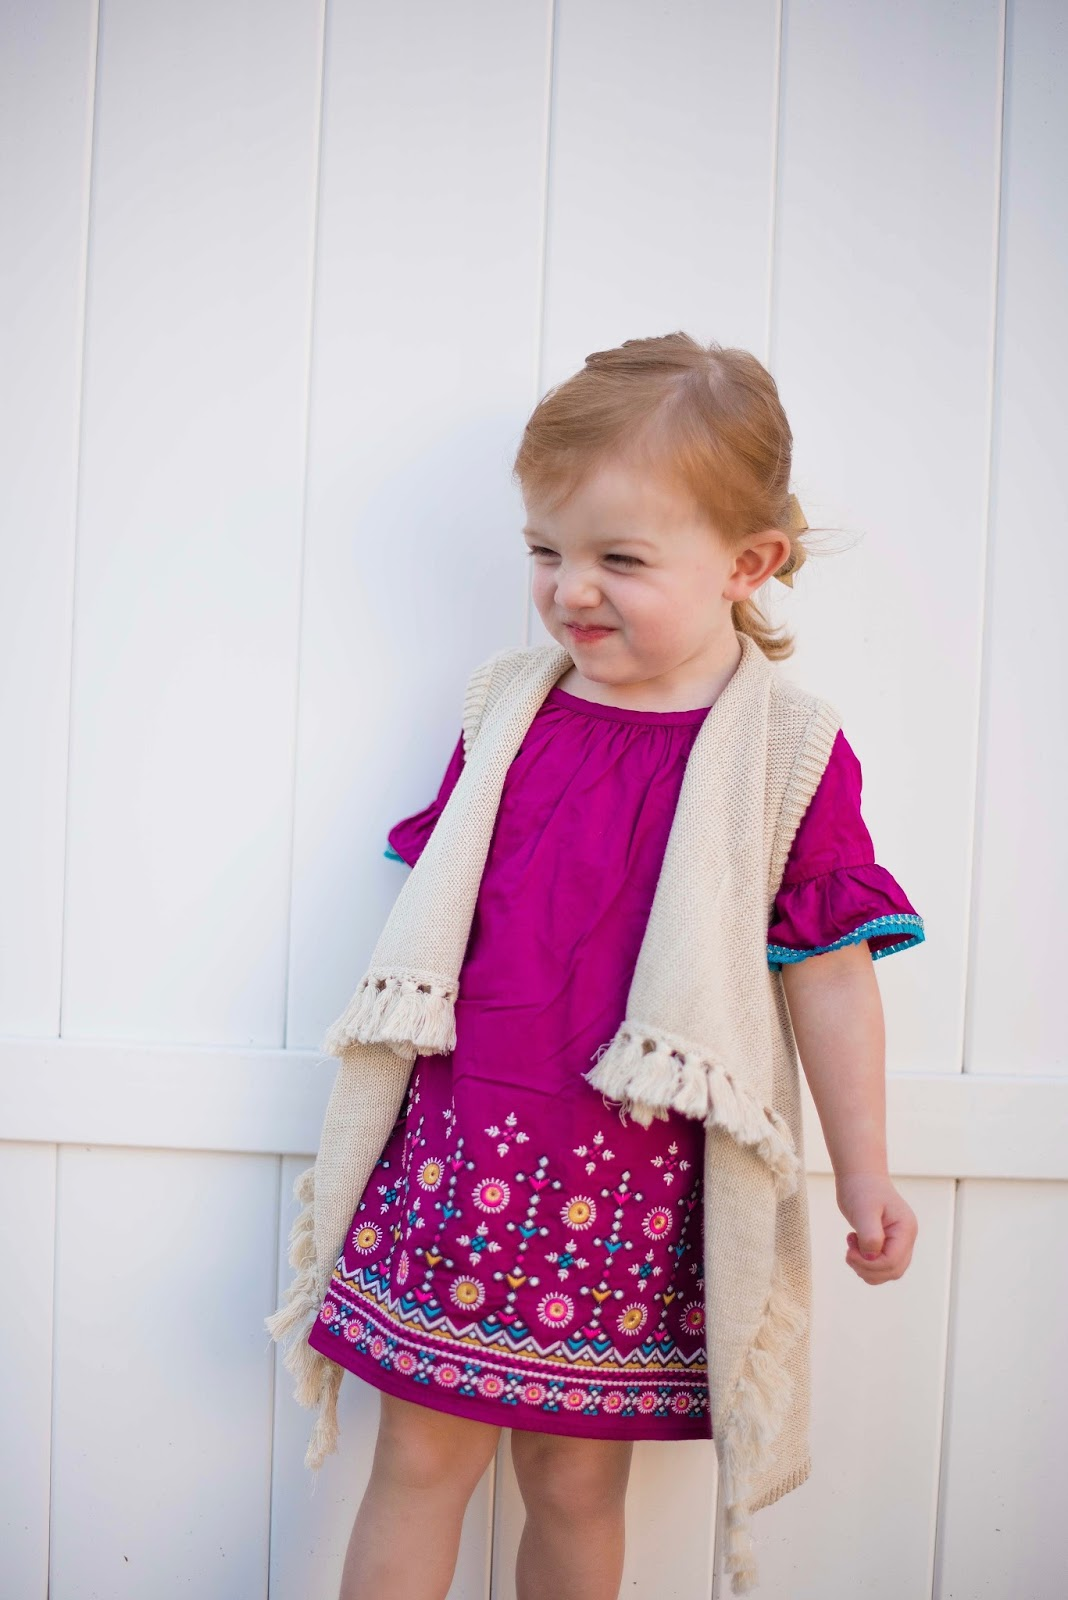 Toddler Fashion - Something Delightful Blog